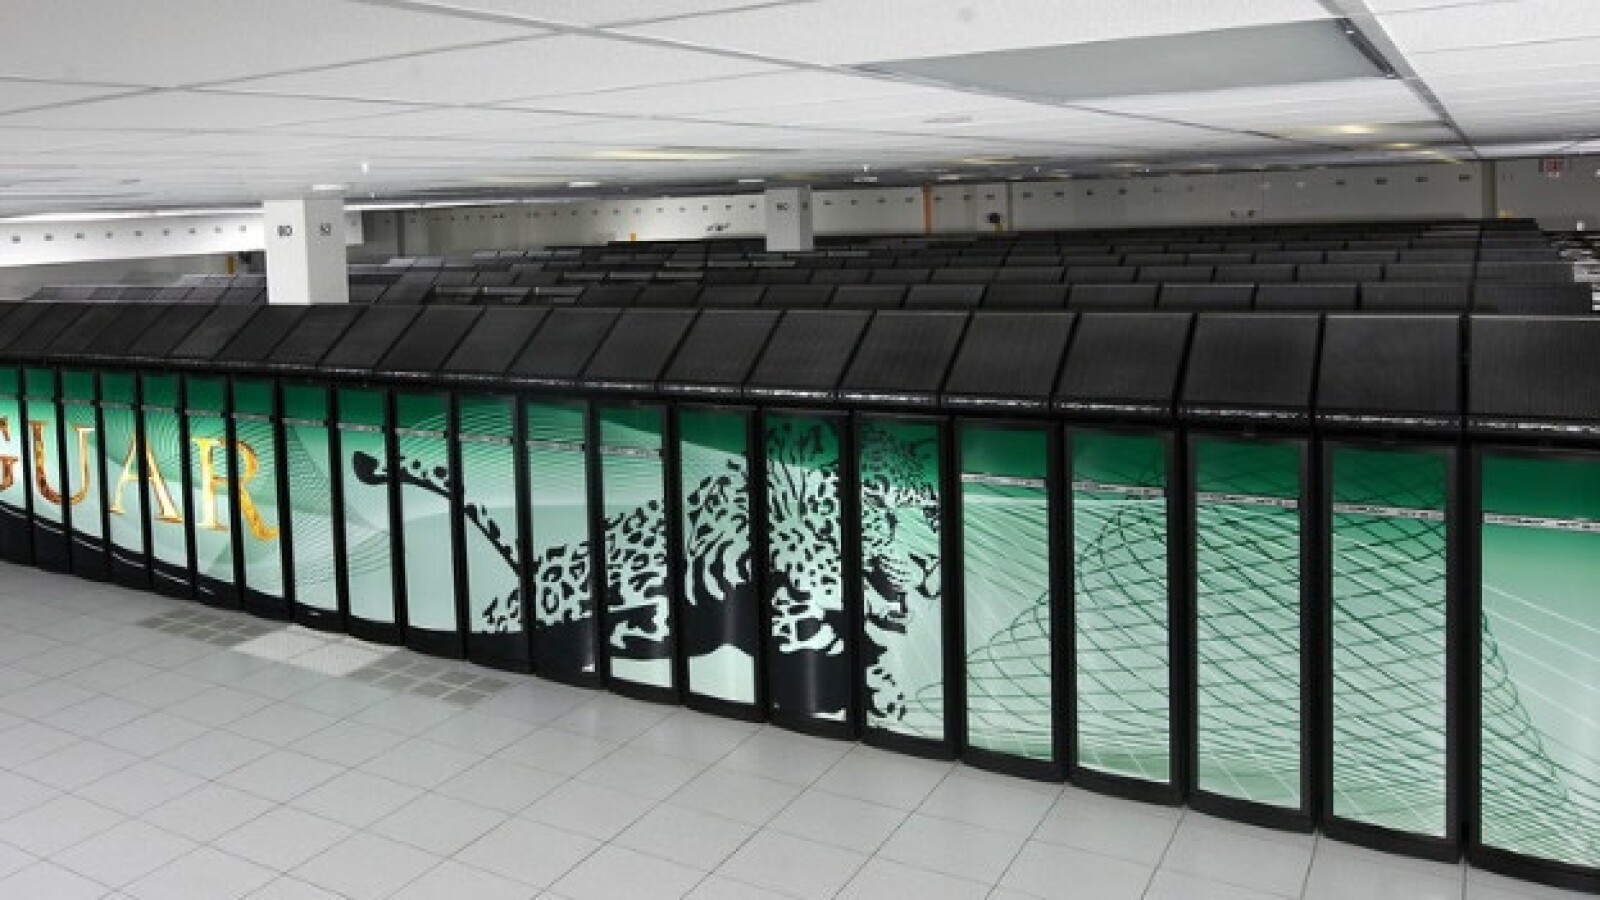 supercomputadora computadora cry jaguar